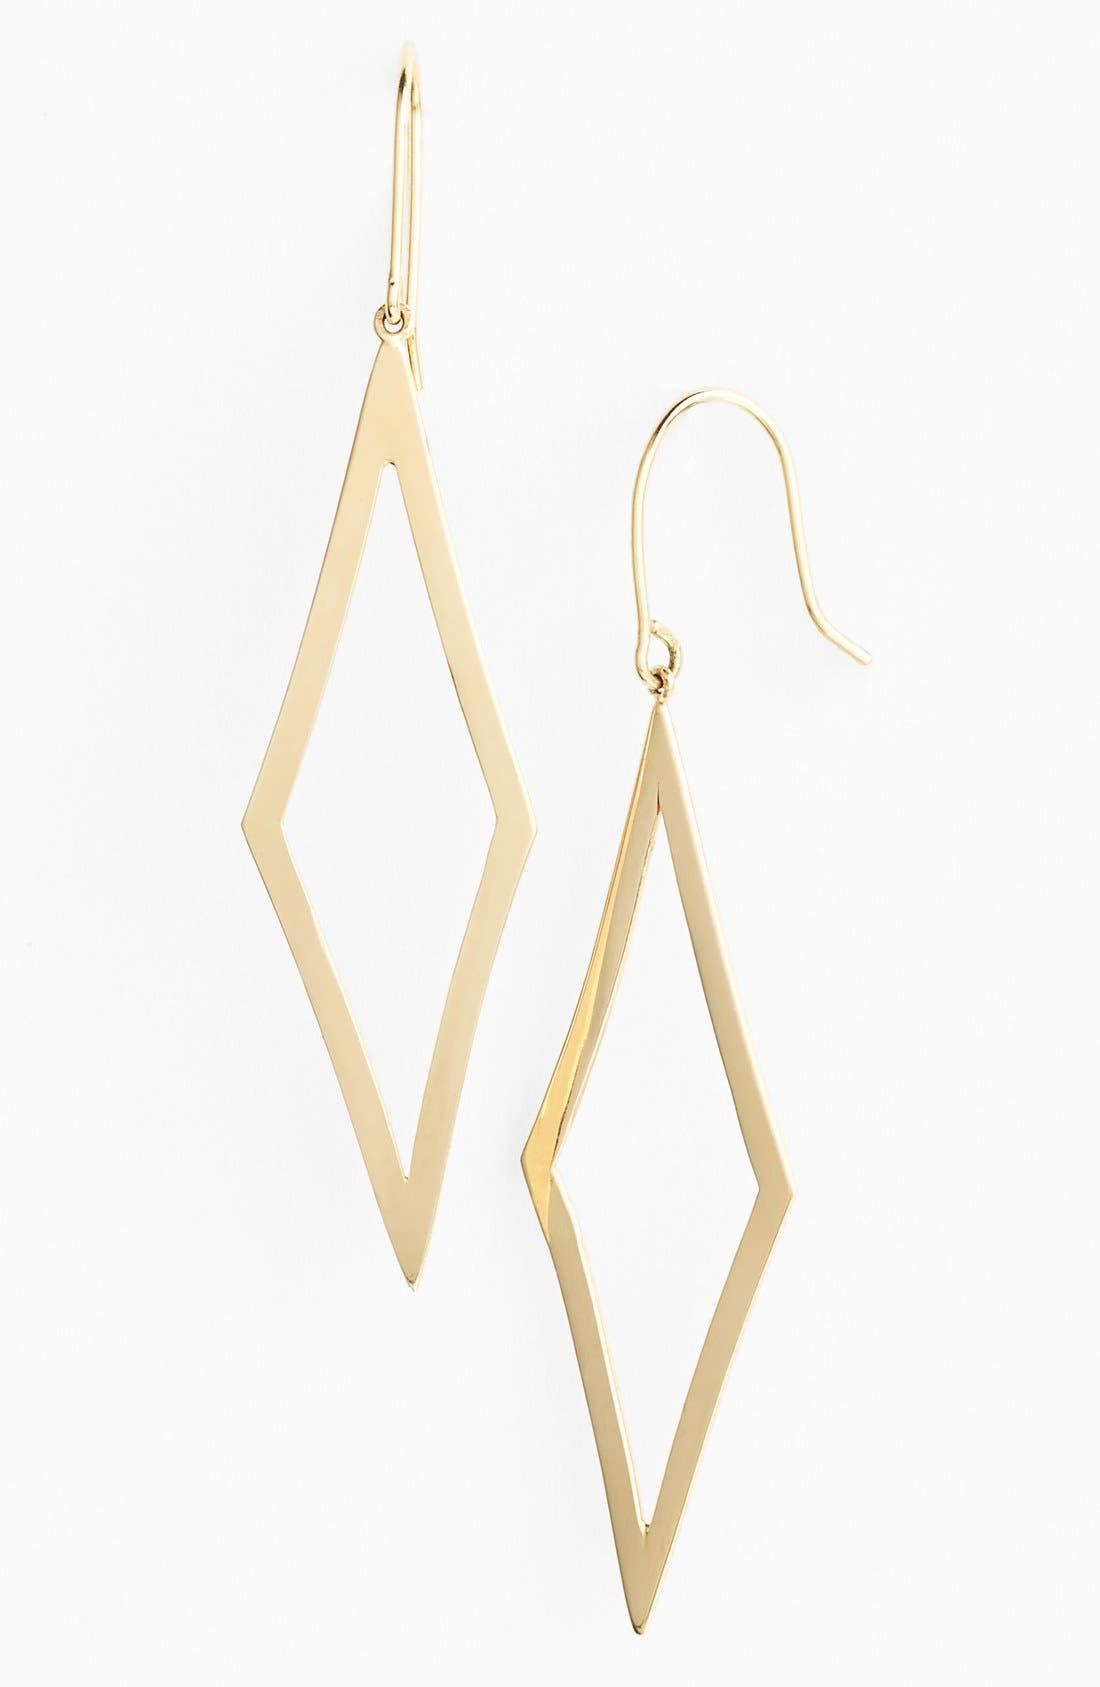 Alternate Image 1 Selected - Lana Jewelry 'Aura' Small Drop Earrings